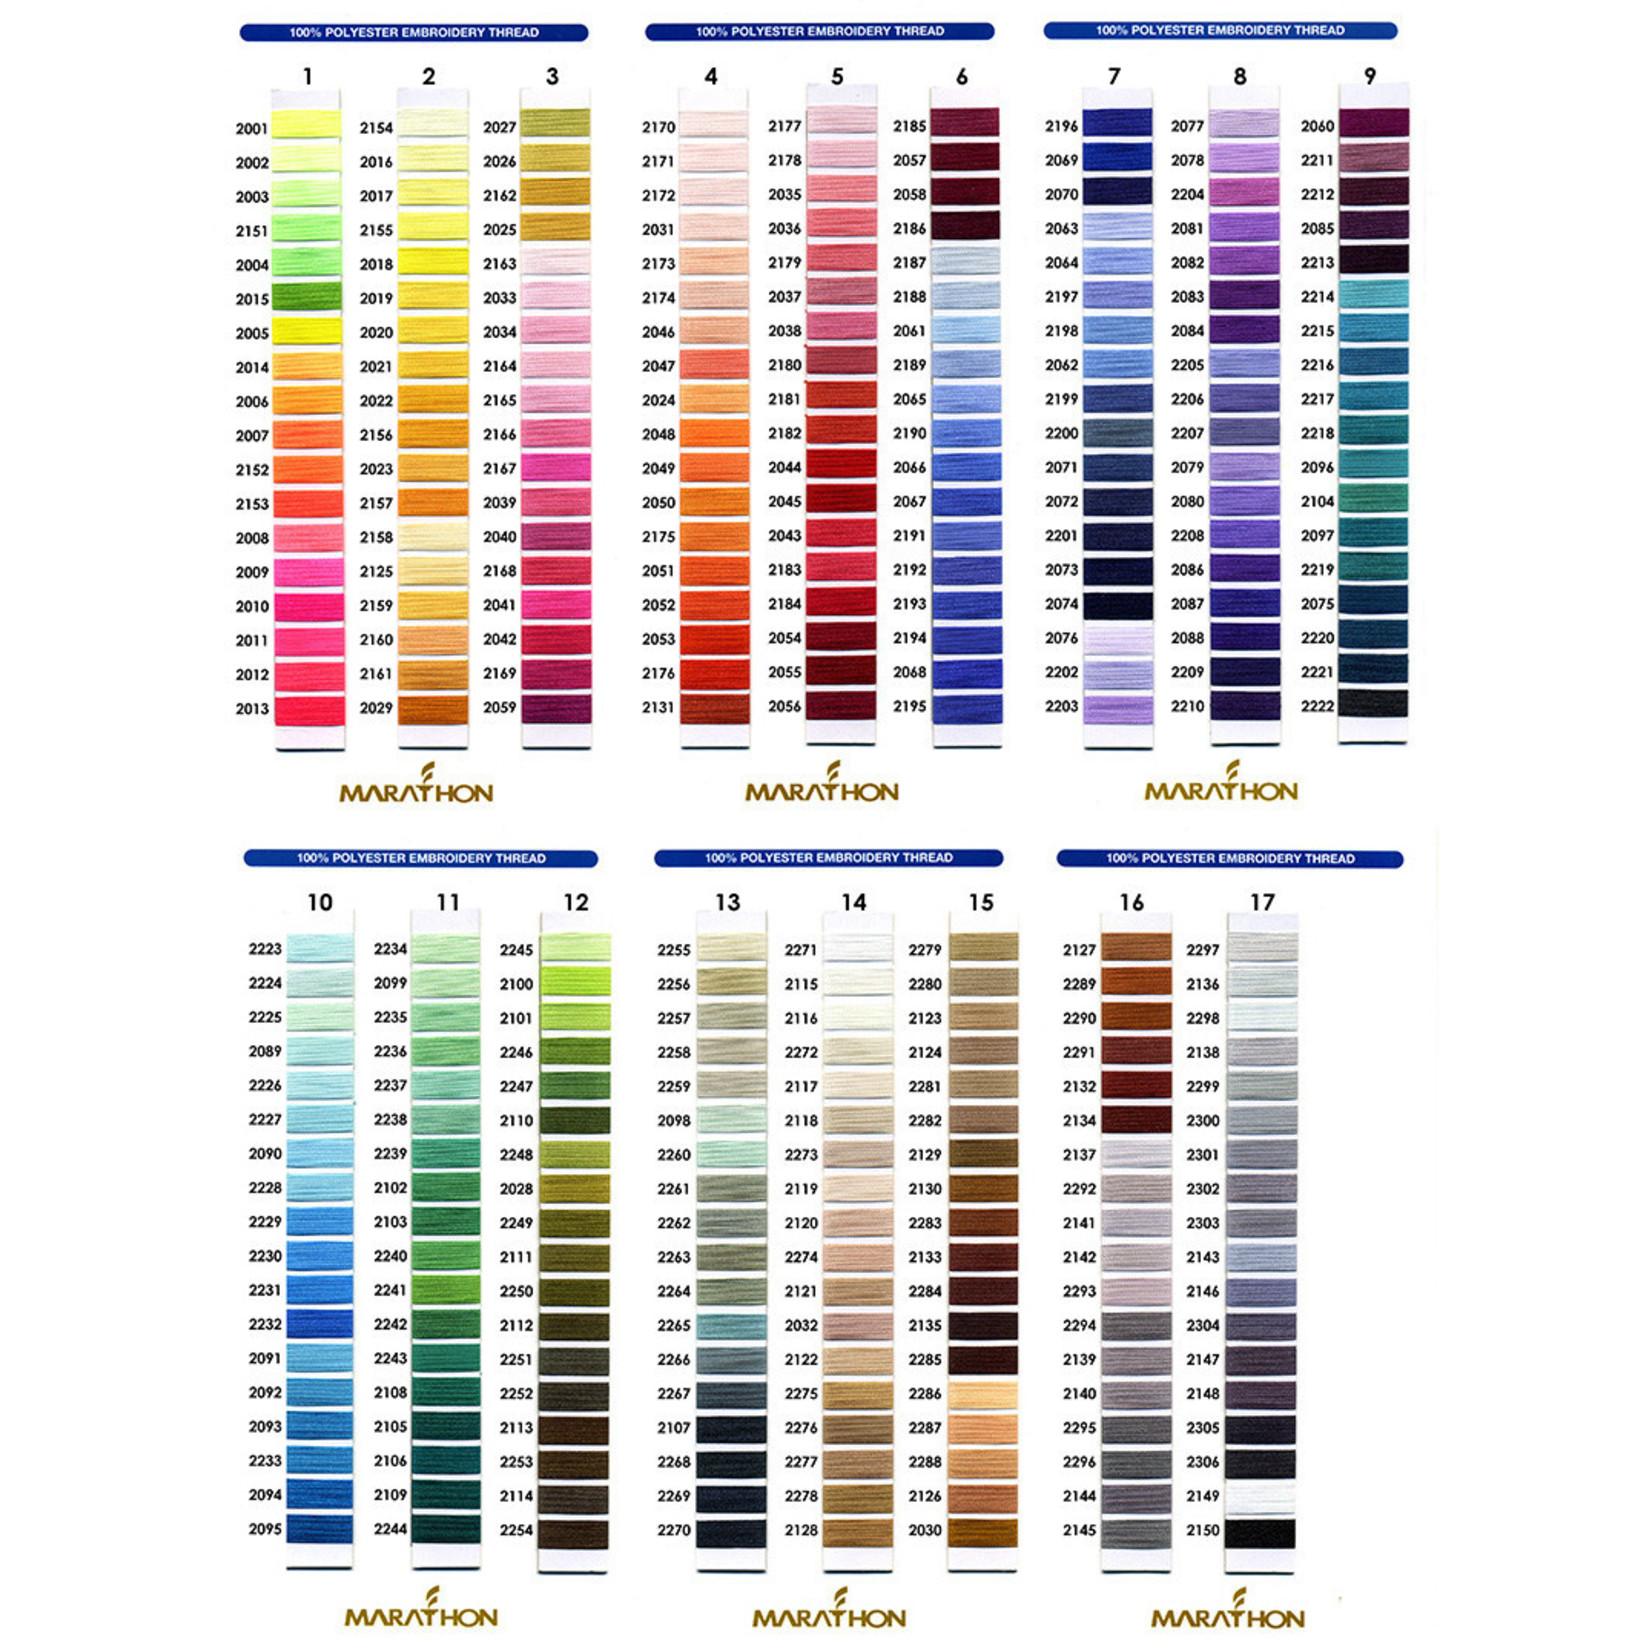 MARATHON Colour 2229 - 5000mtr POLY EMBROIDERY THREAD Teal Blue